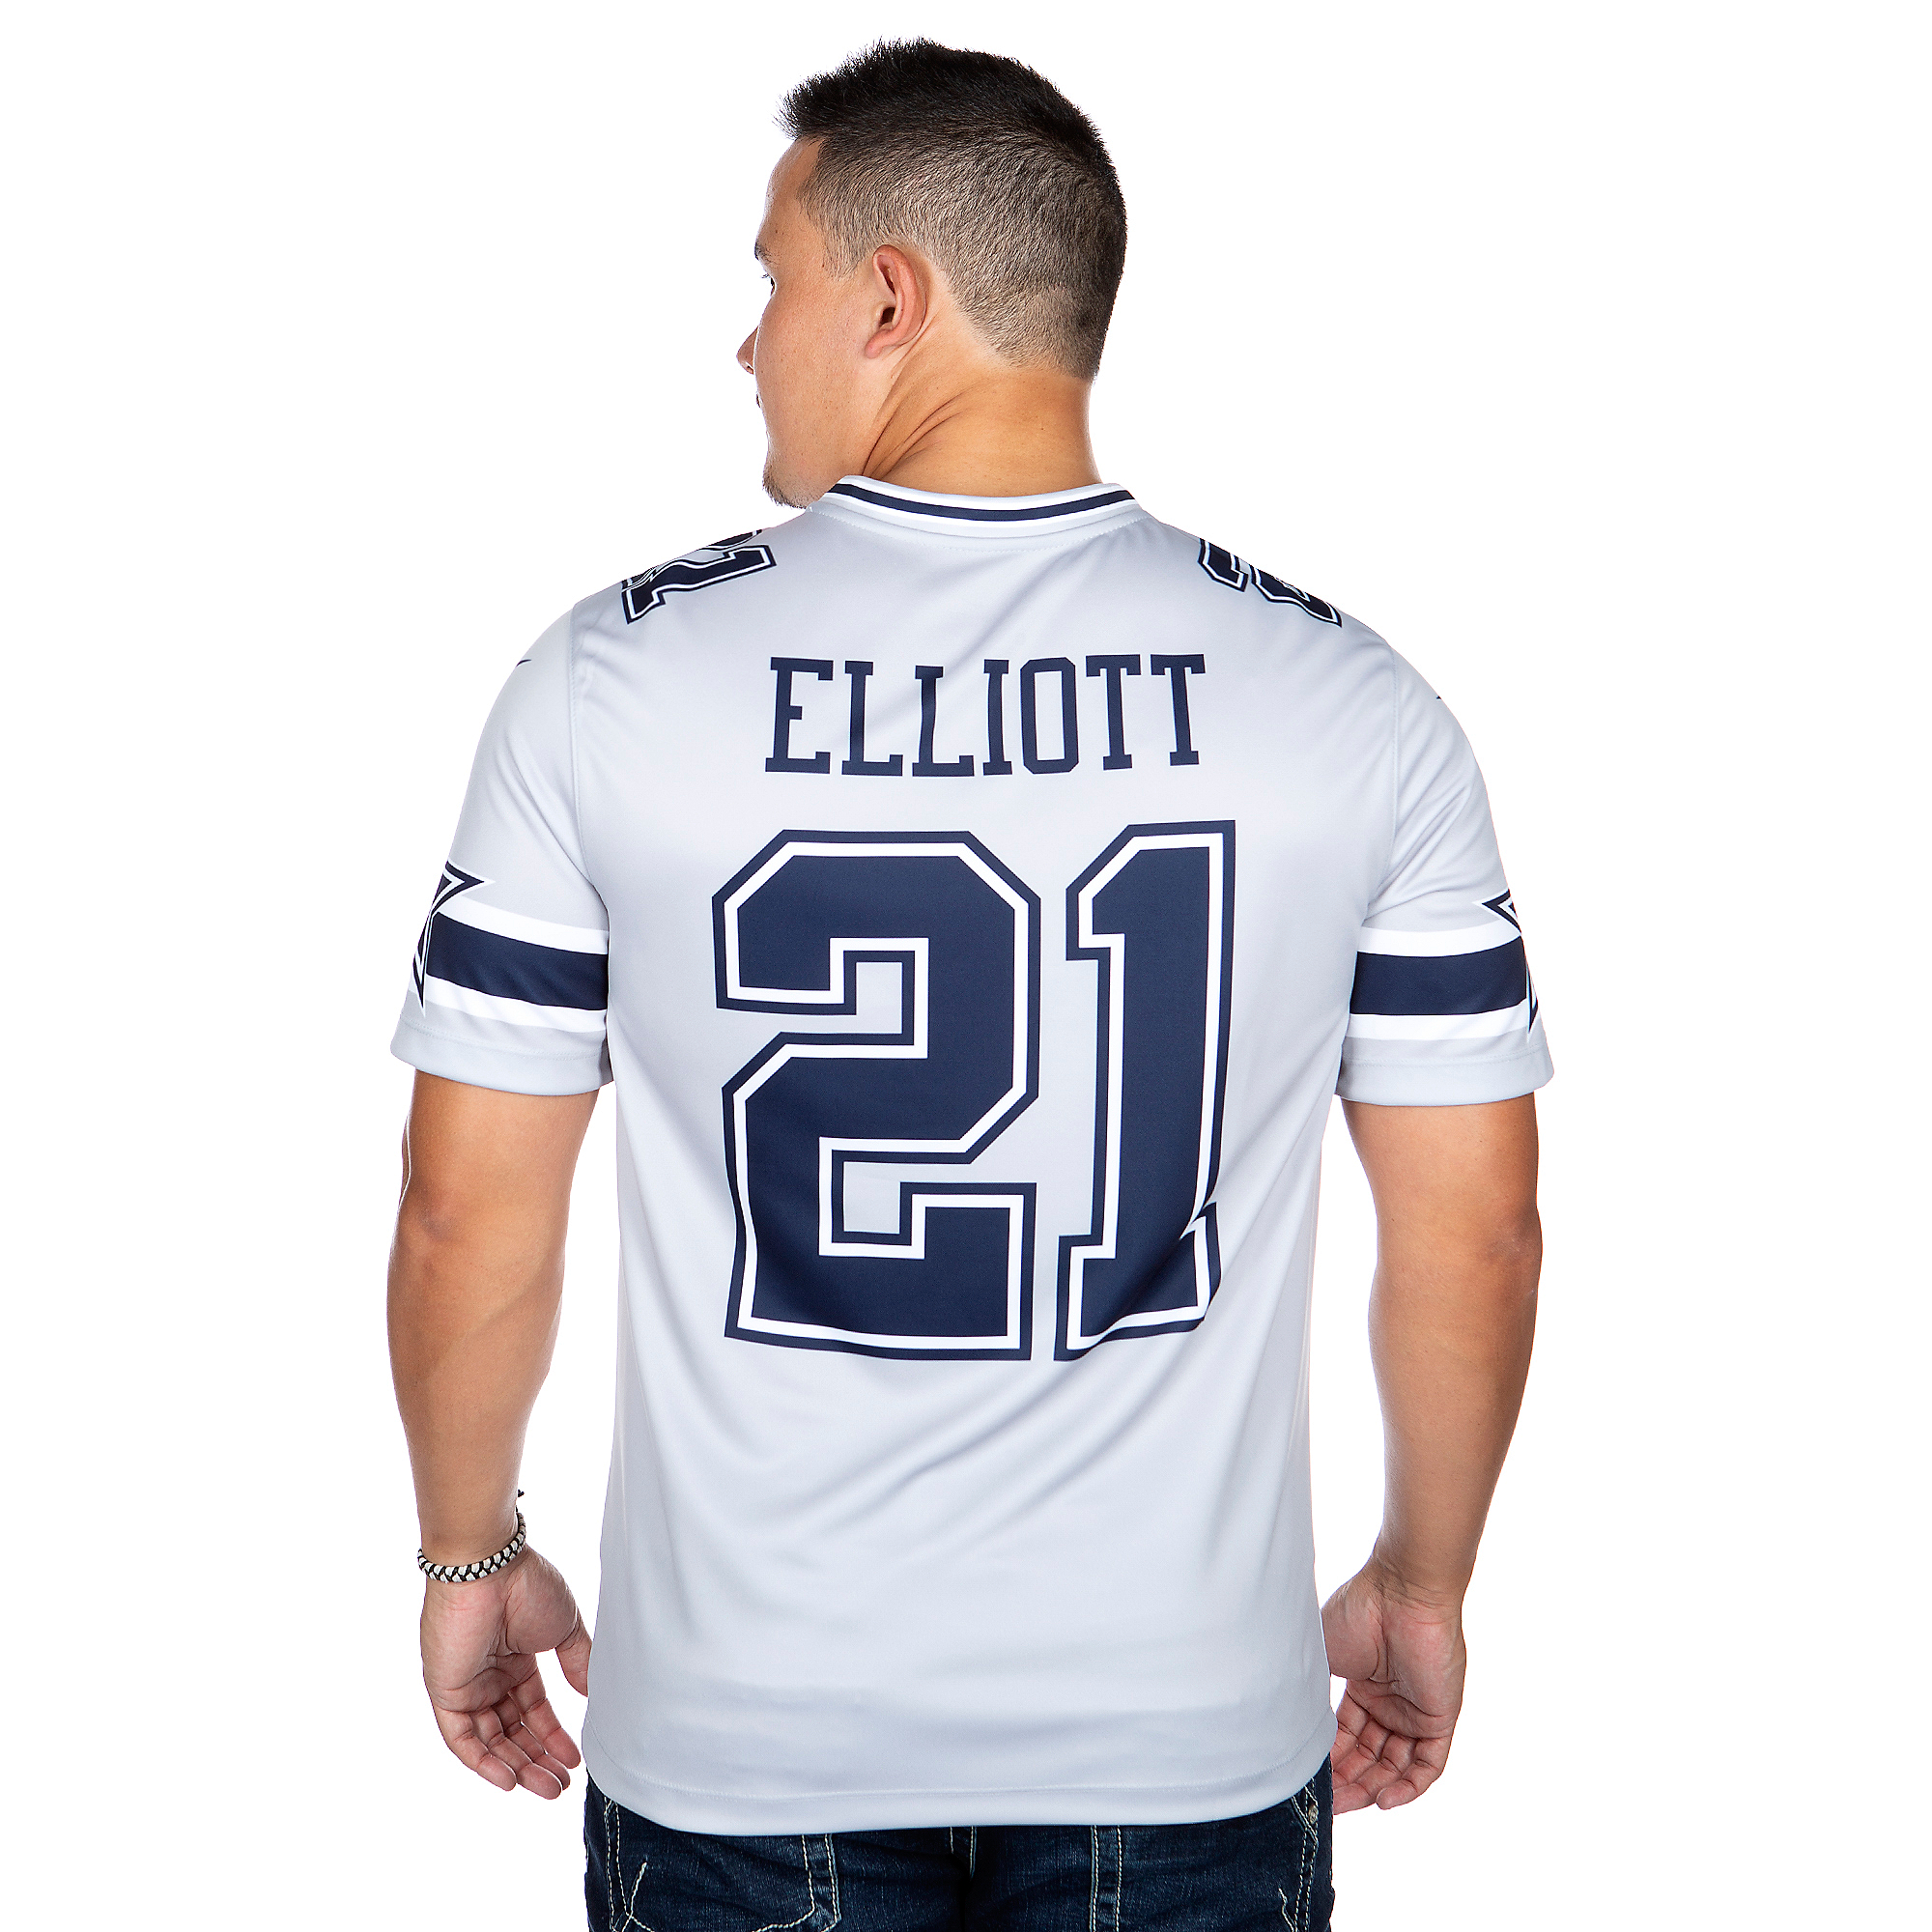 hot sales 8faec 6dd60 Dallas Cowboys Ezekiel Elliott #21 Nike Legend Secondary ...